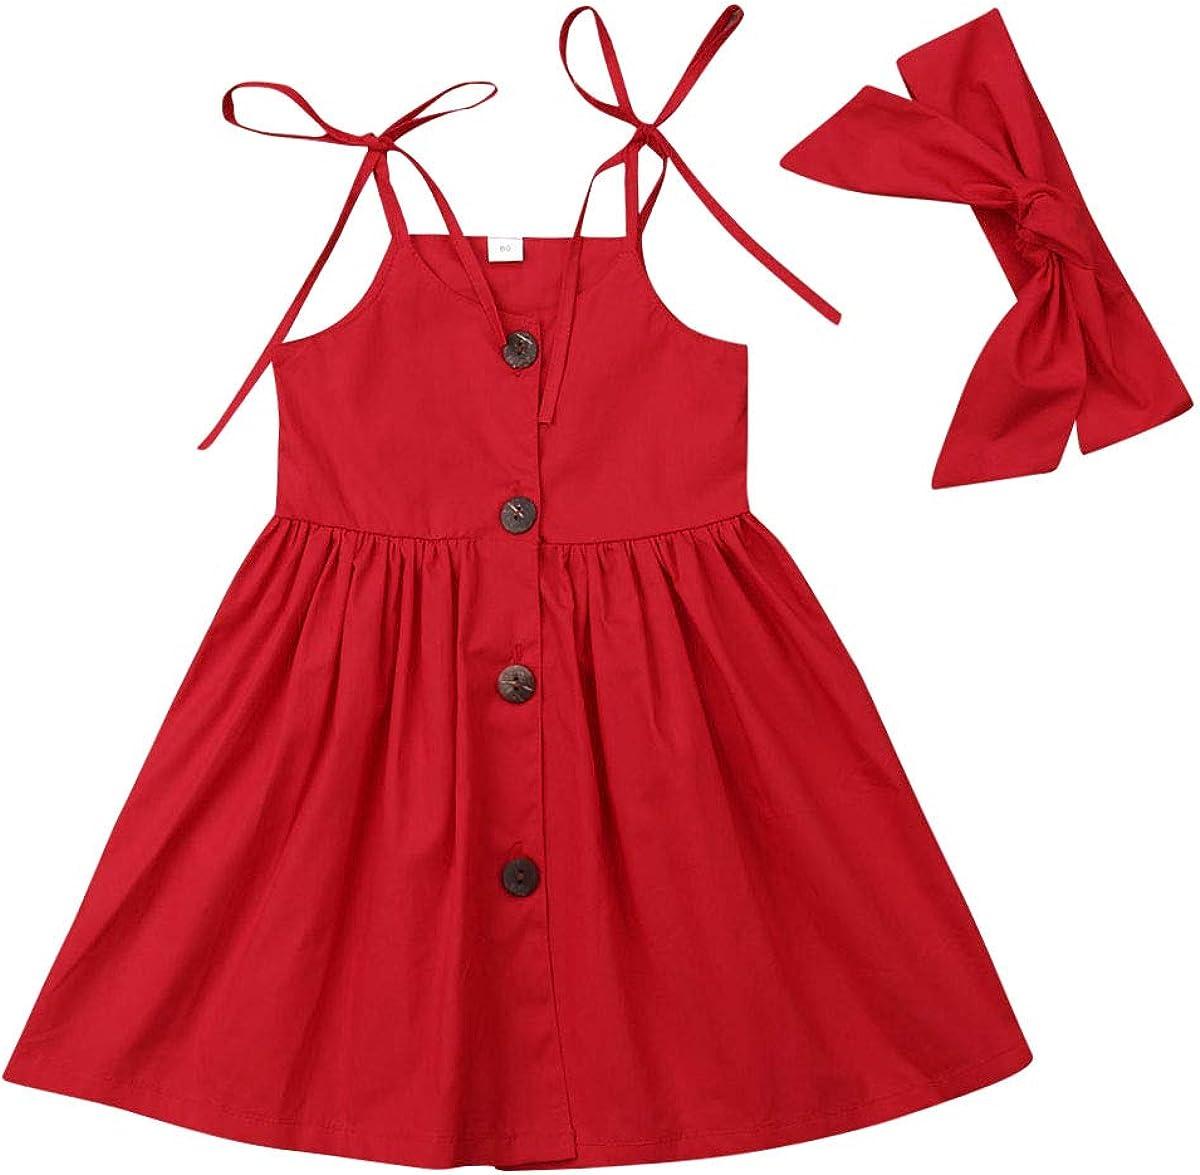 Cartoon Bow Casual Polka Dot Skirt Set Playwear Outfits Baby Toddler Girls Ruffles Disney Dress Overall